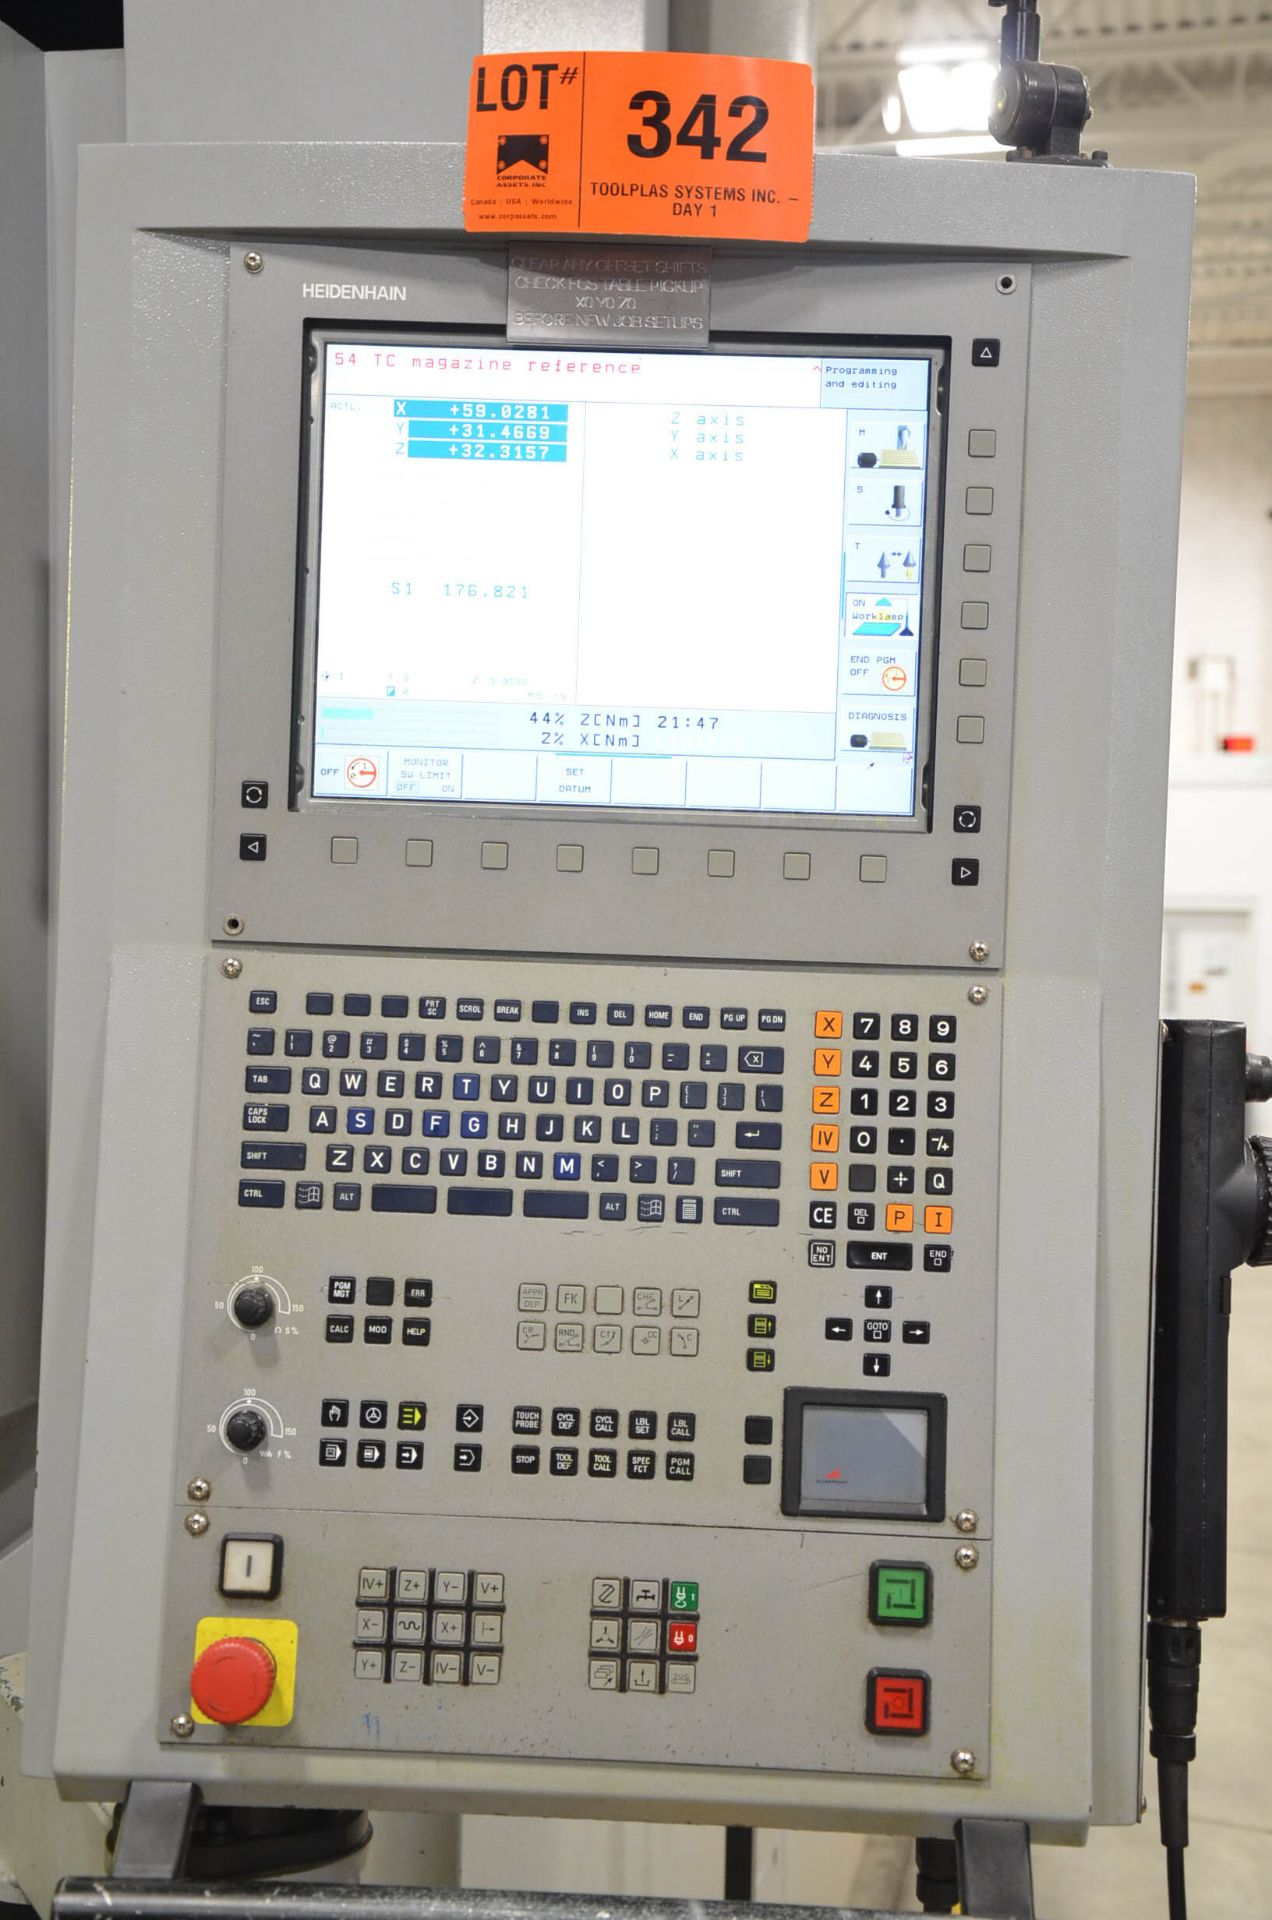 DYNAMIC SPEED (2010) GT-3016V GANTRY-TYPE VERTICAL MACHINING CENTER WITH HEIDENHAIN ITNC530 CNC - Image 7 of 12